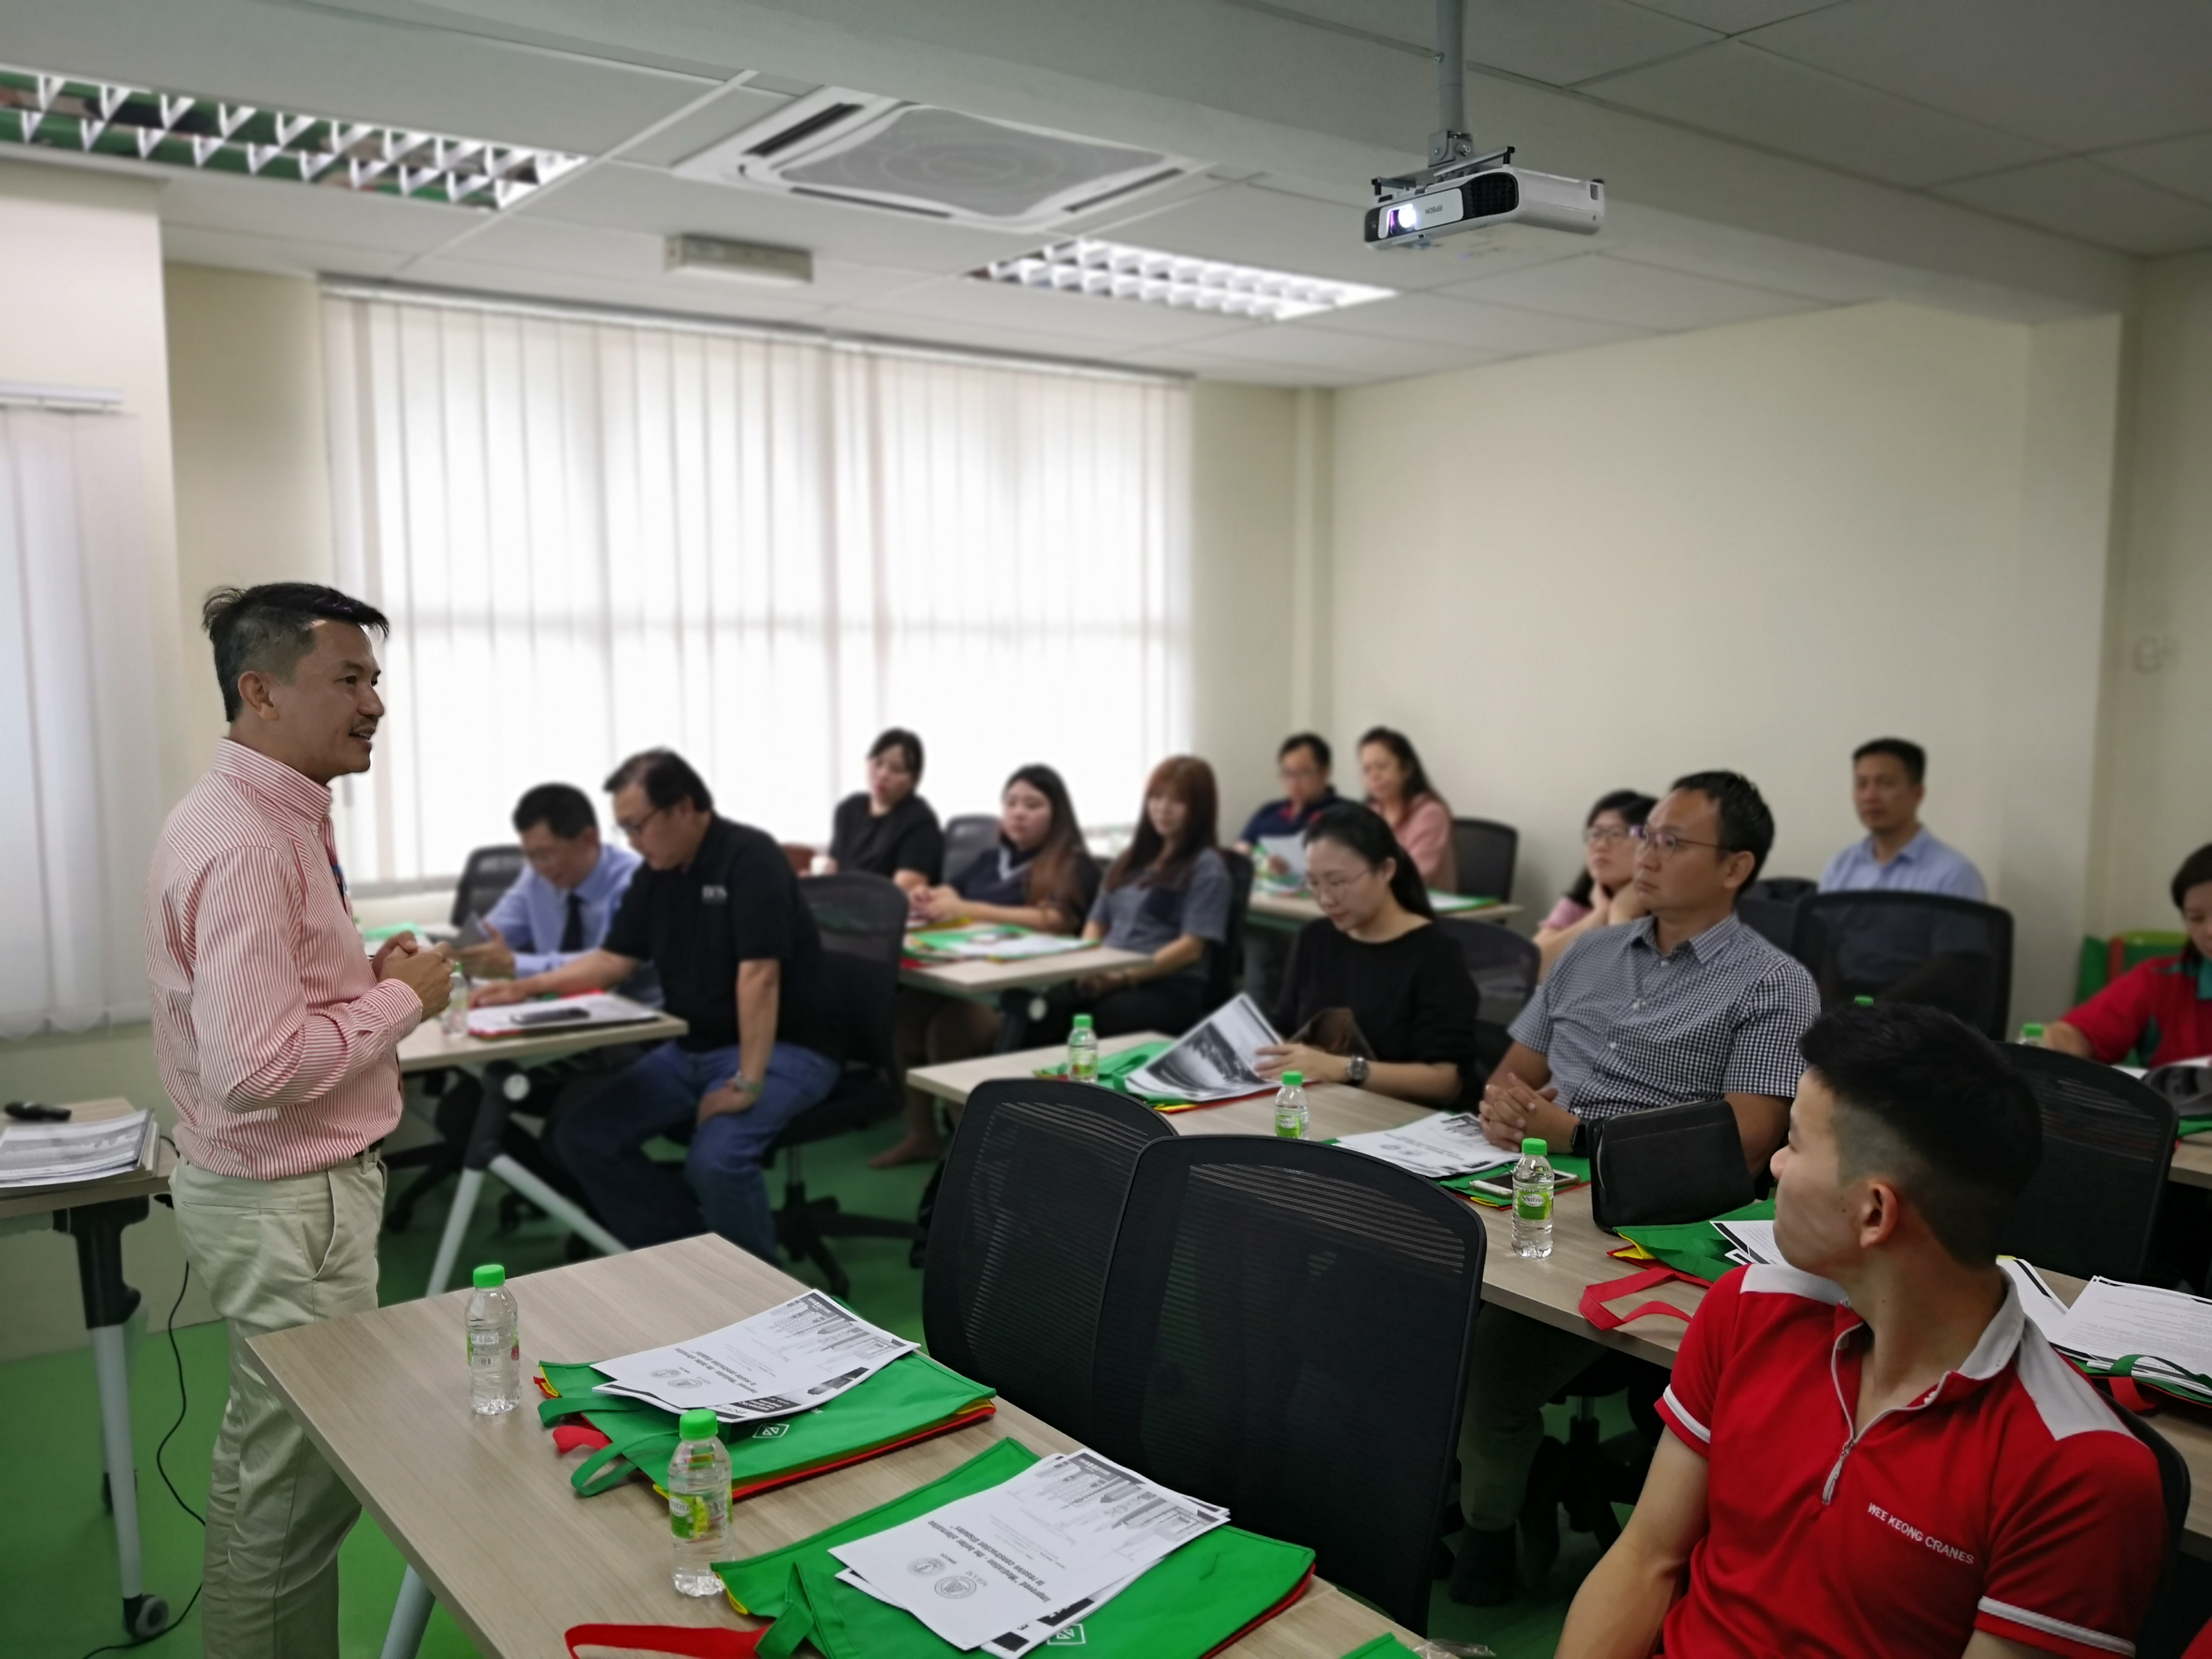 Mediation Talk at MMCOA / 马来西亚吊秤车同业公会举办【如何进行调解】讲座会